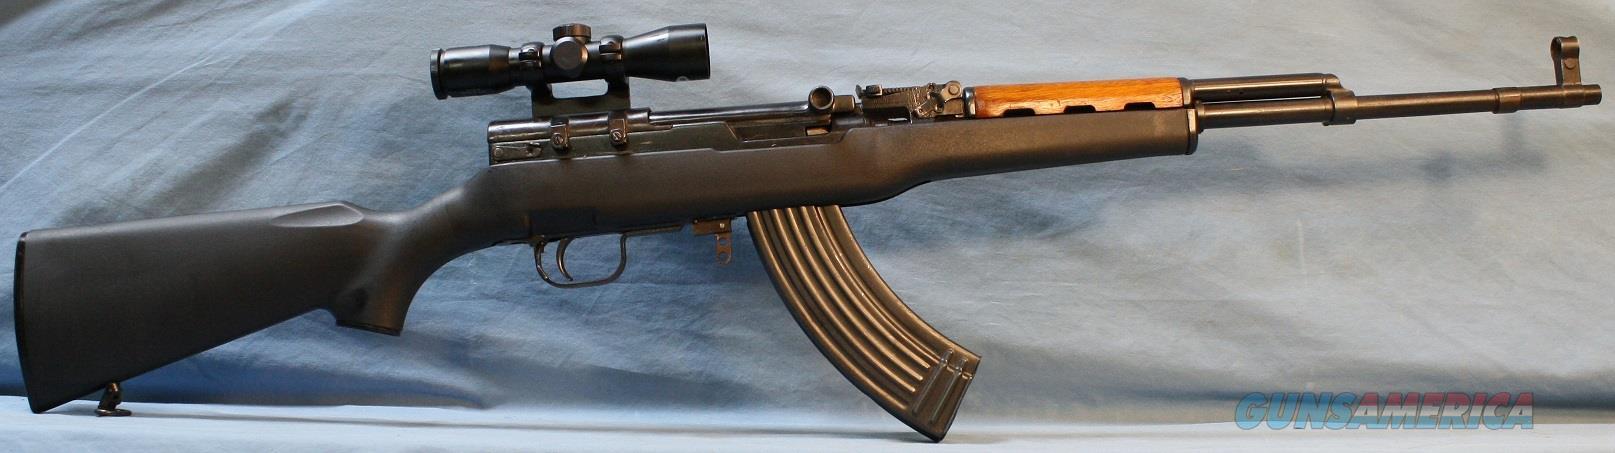 Norinco SKS Semi-Automatic Carbine, 7.62x39 Free Shipping!  Guns > Rifles > Norinco Rifles